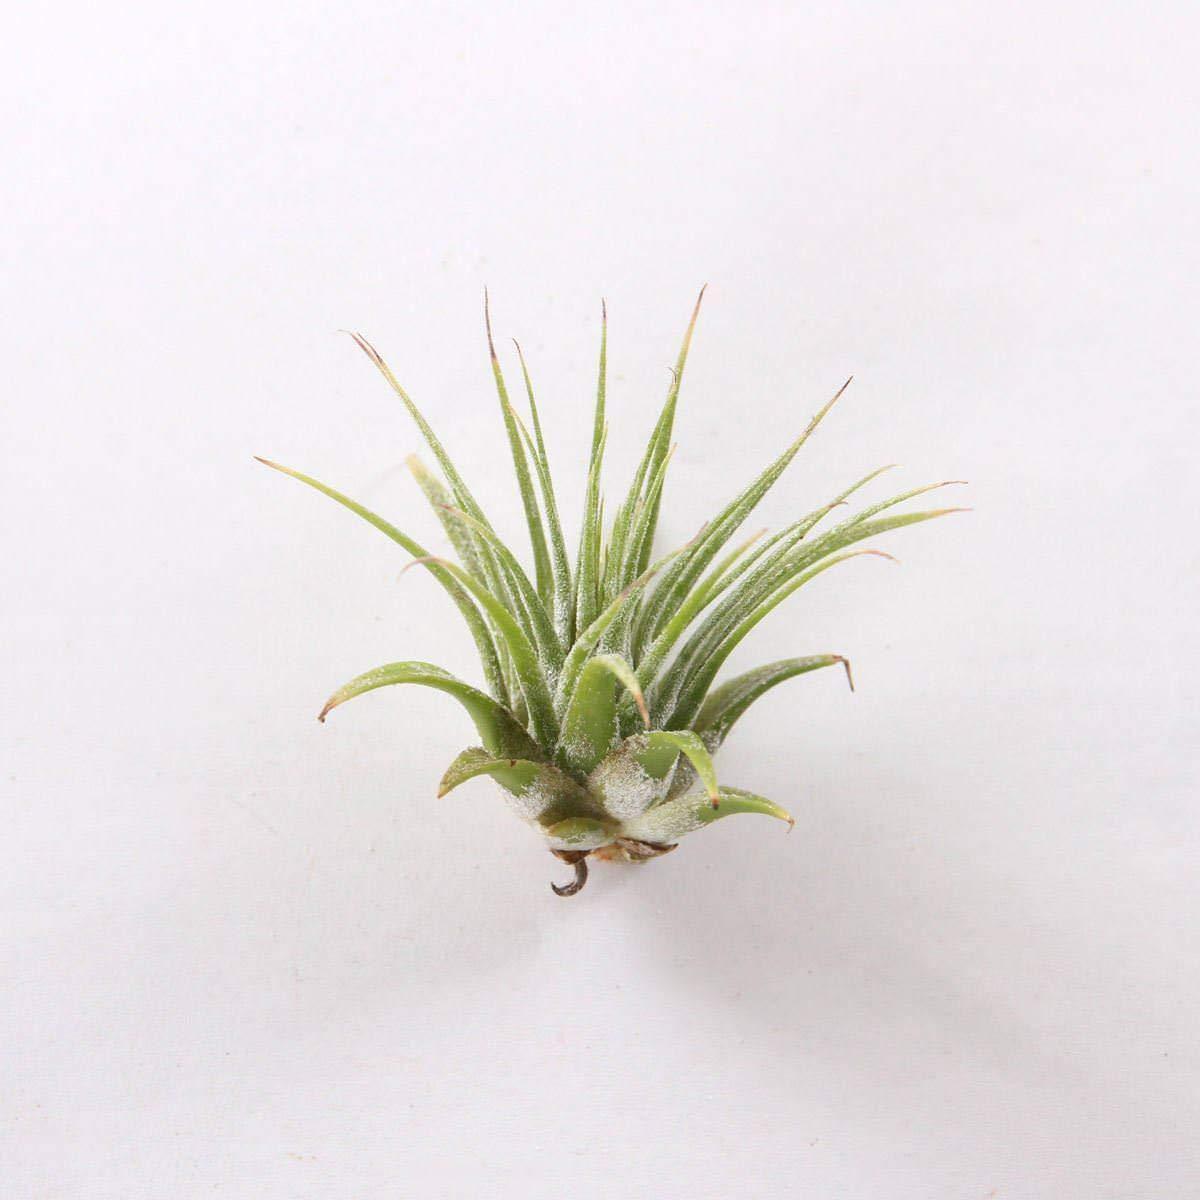 Bulk 100 Air Plants Variety Pack (50 Ionantha, 50 Fuchsii) - Wholesale by AchmadAnam (Image #2)